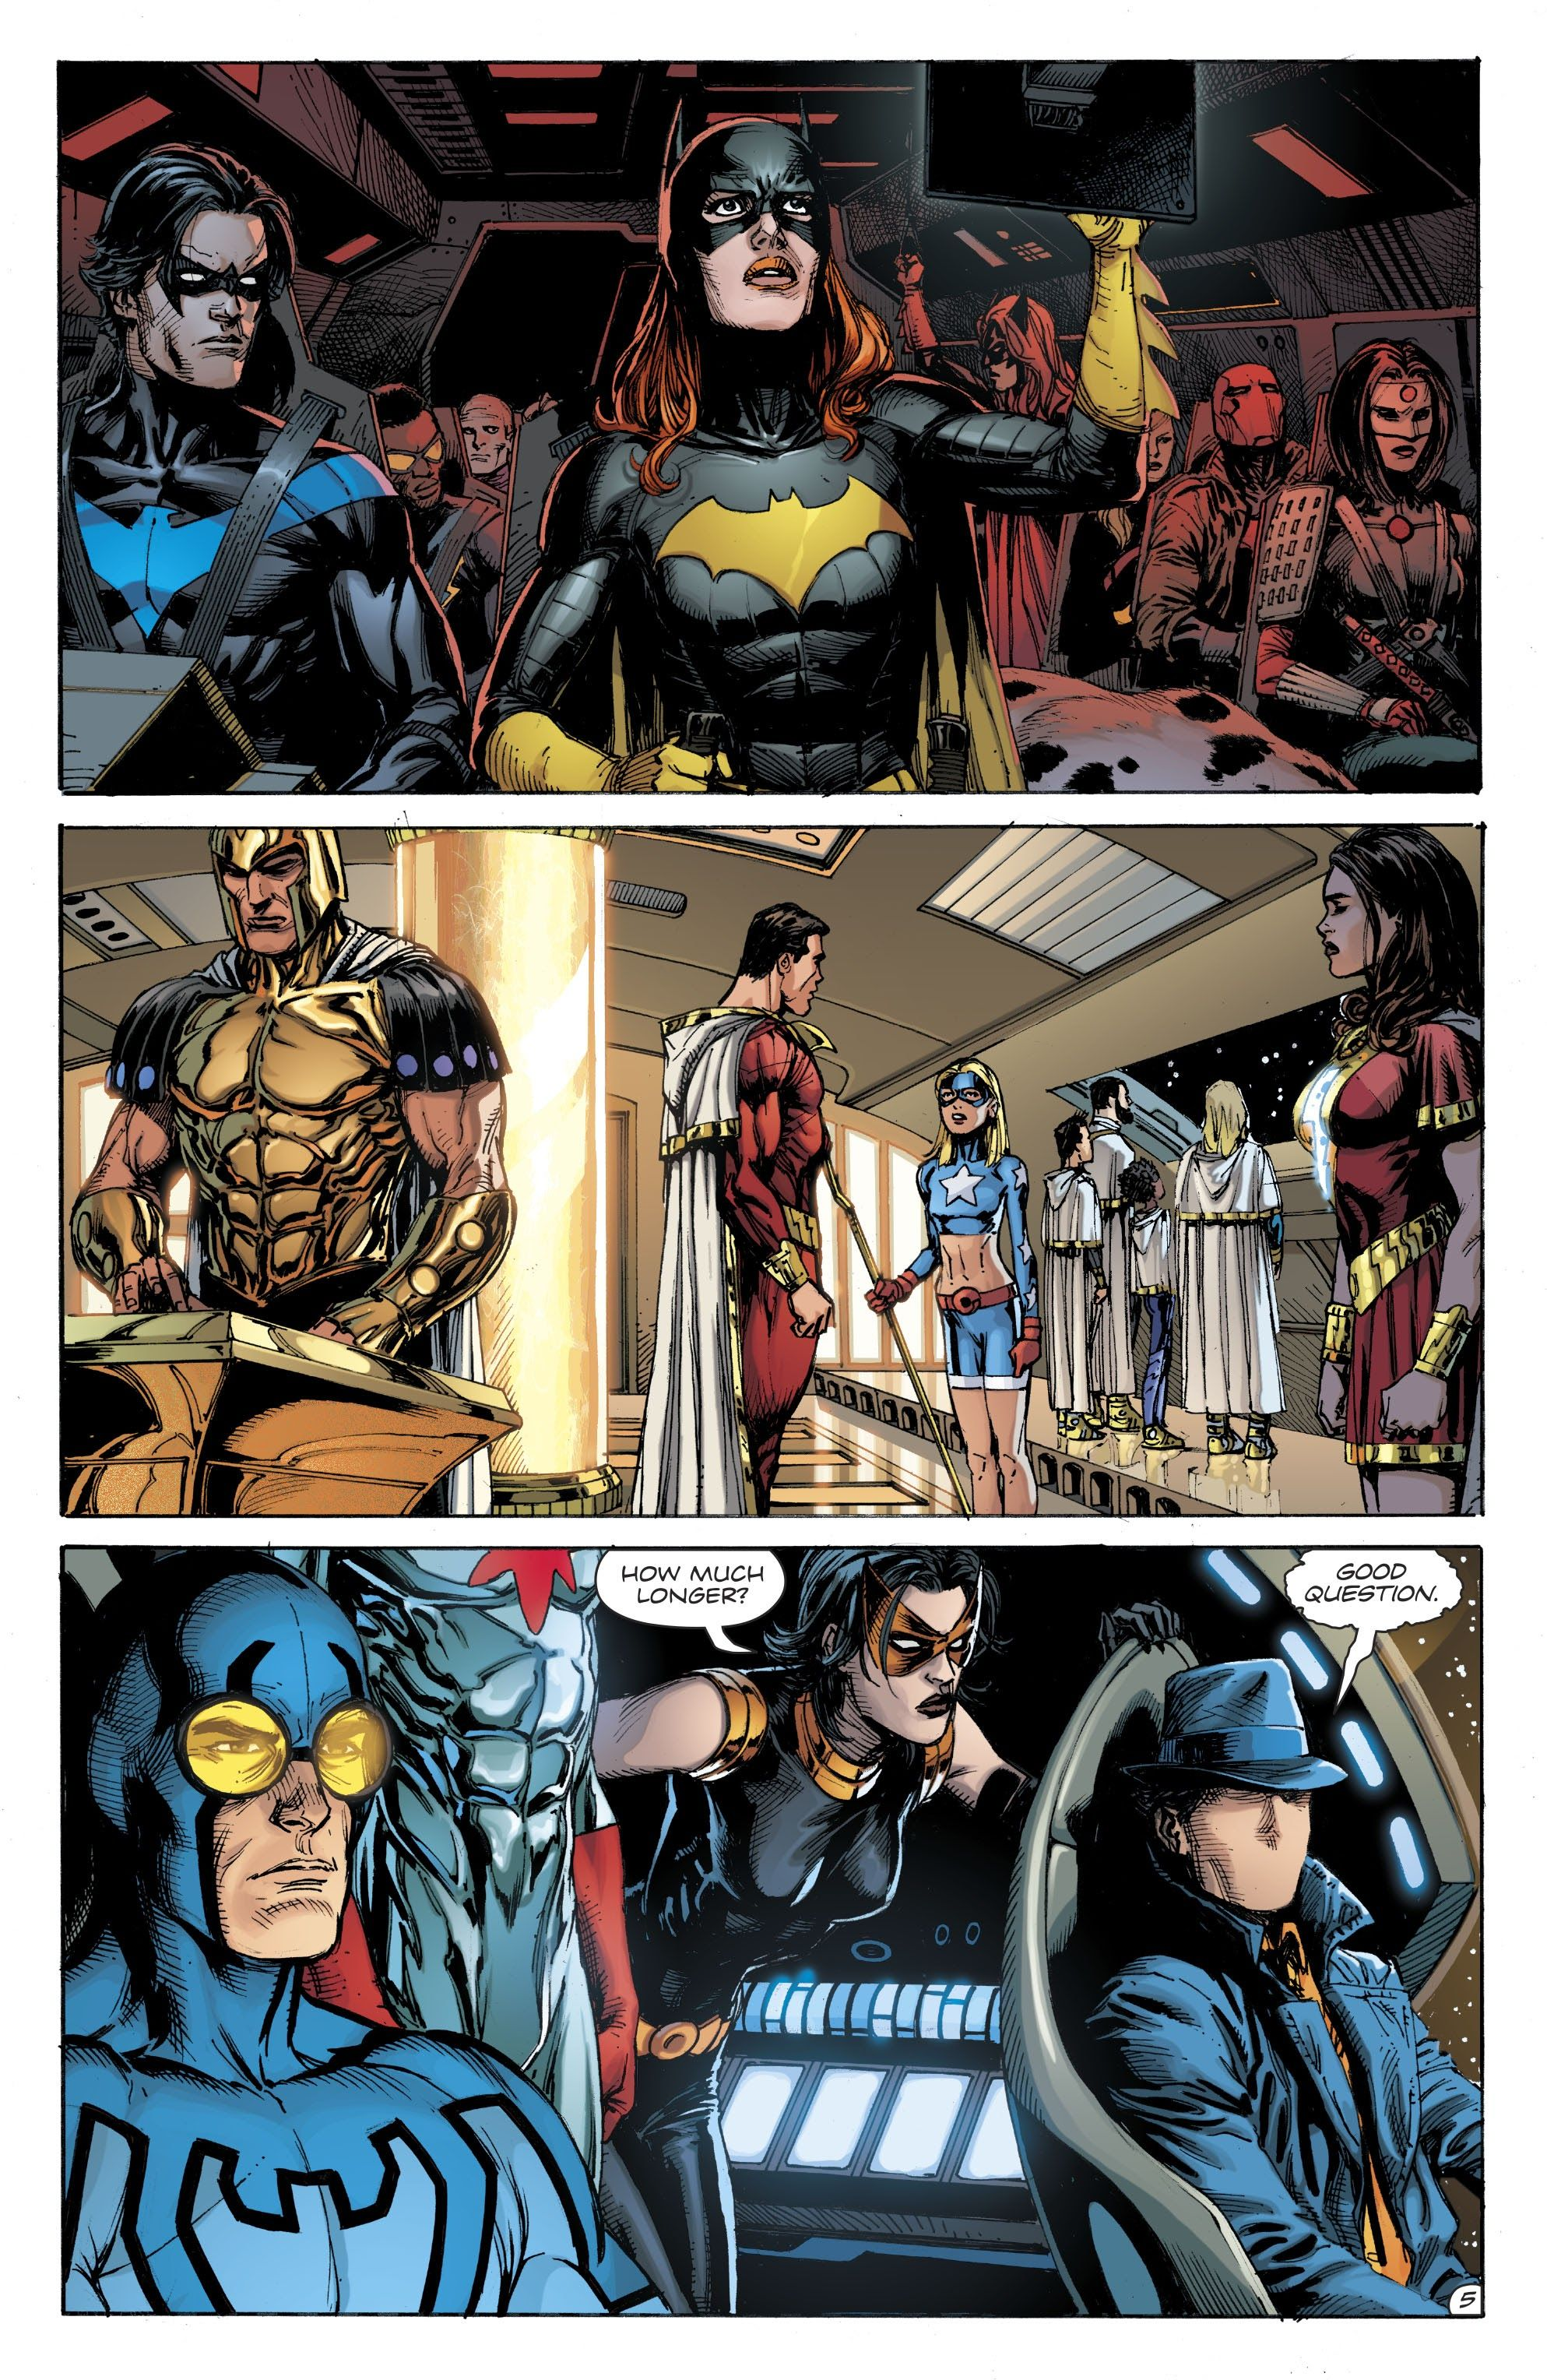 Doomsday Clock Issue 9 Read Doomsday Clock Issue 9 Comic